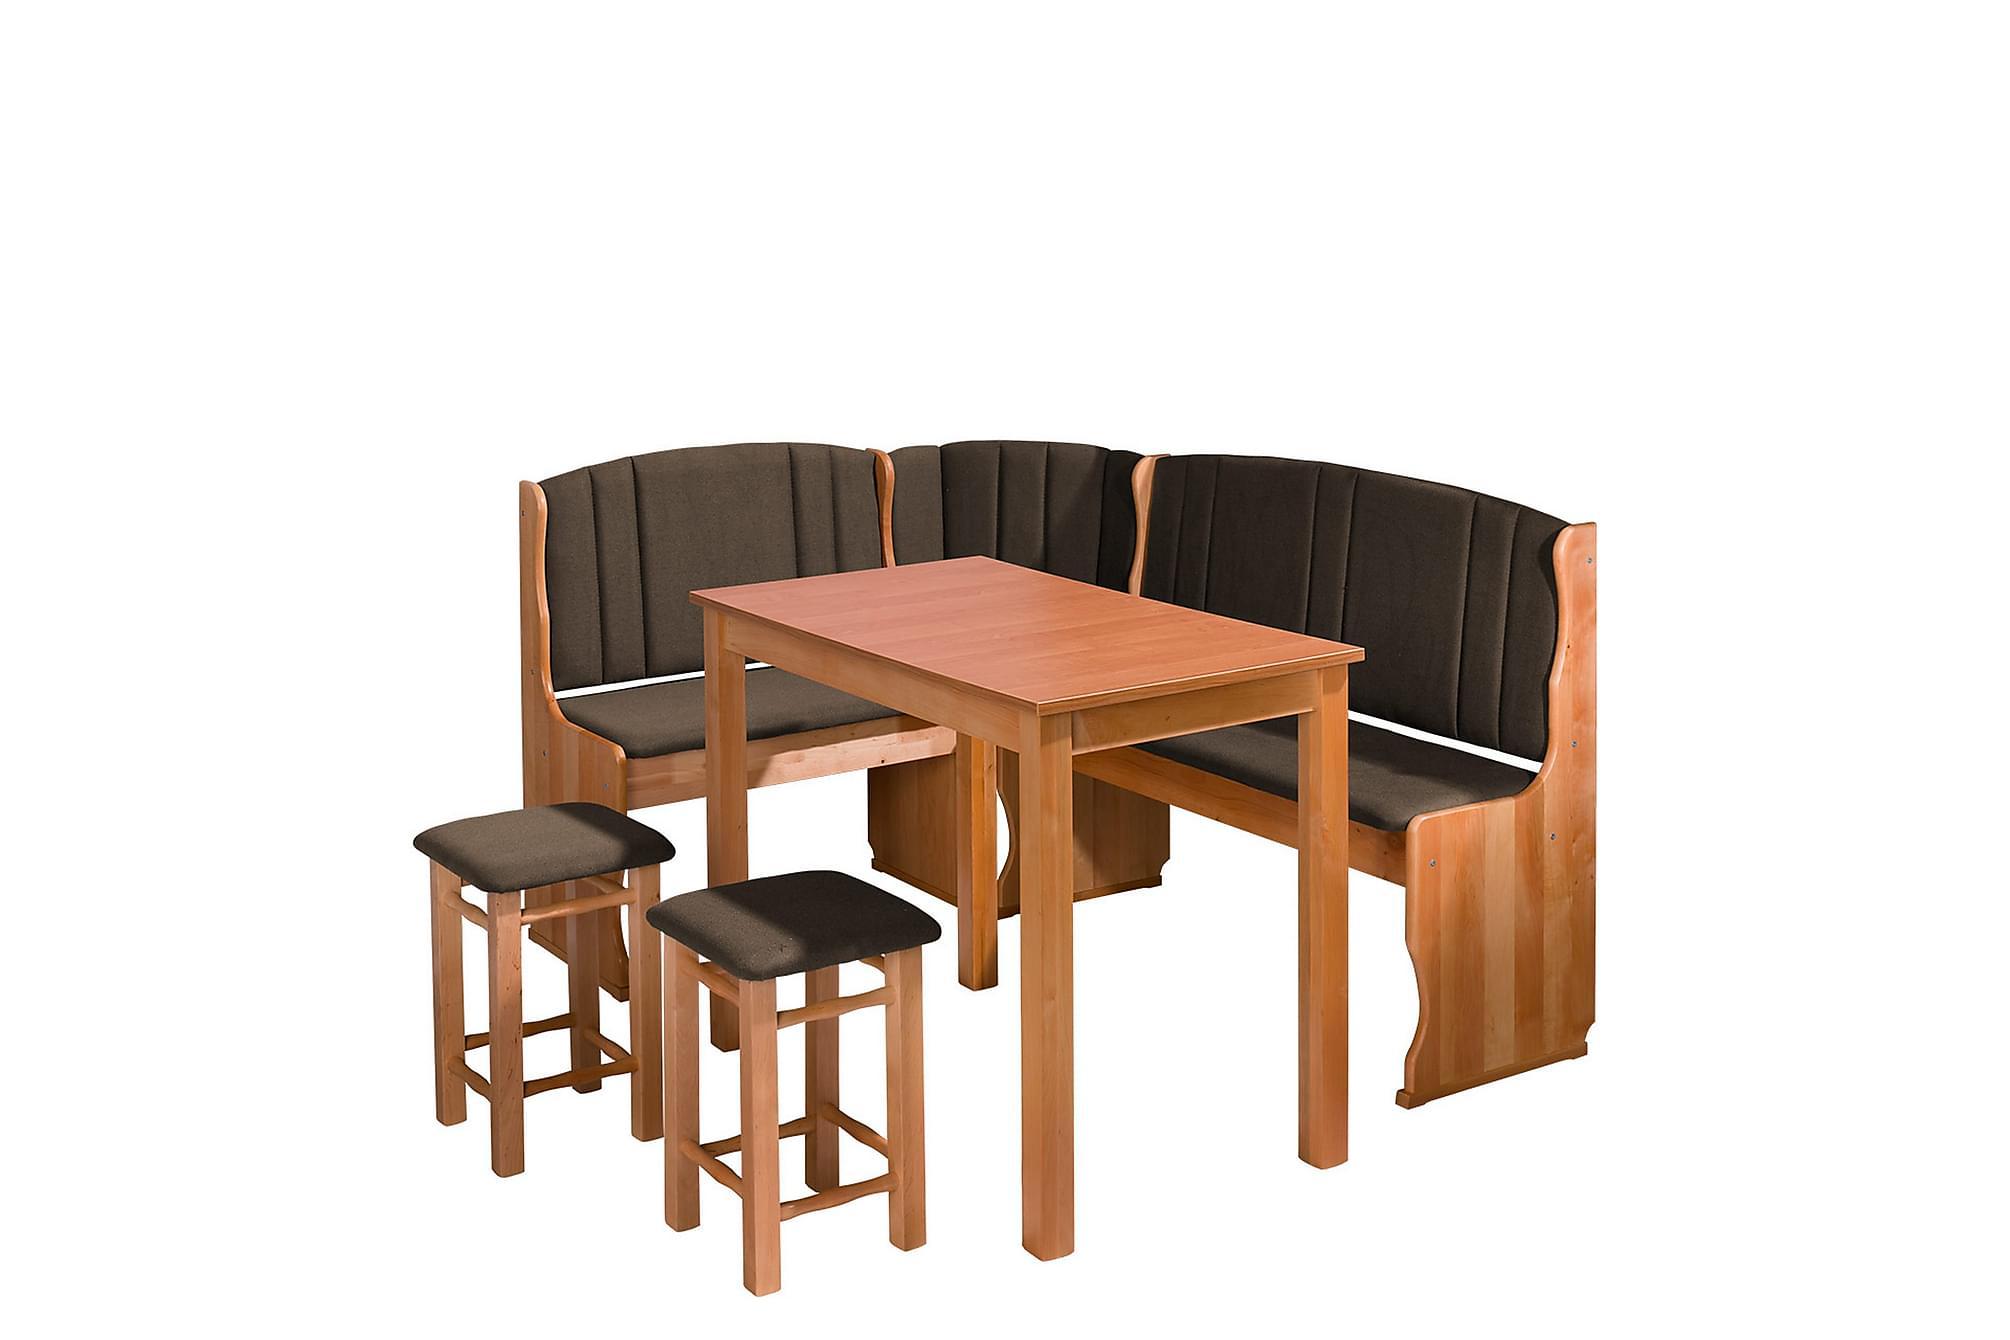 KLEBE Matgrupp Alträ, Möbelset för kök & matplats